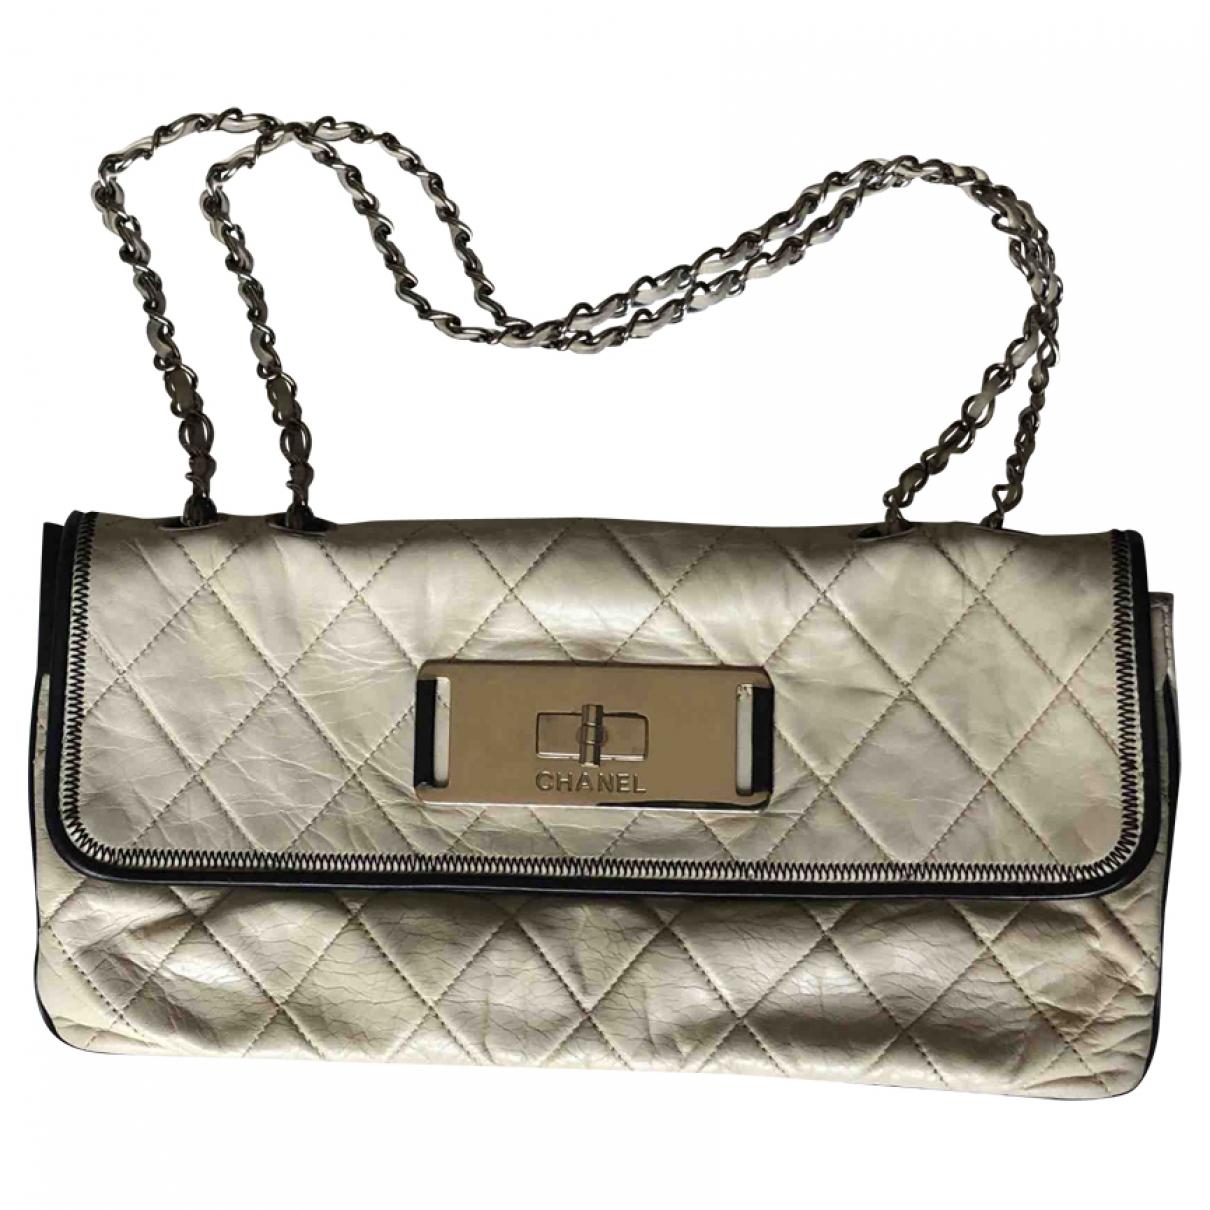 Chanel - Sac a main 2.55 pour femme en cuir - ecru